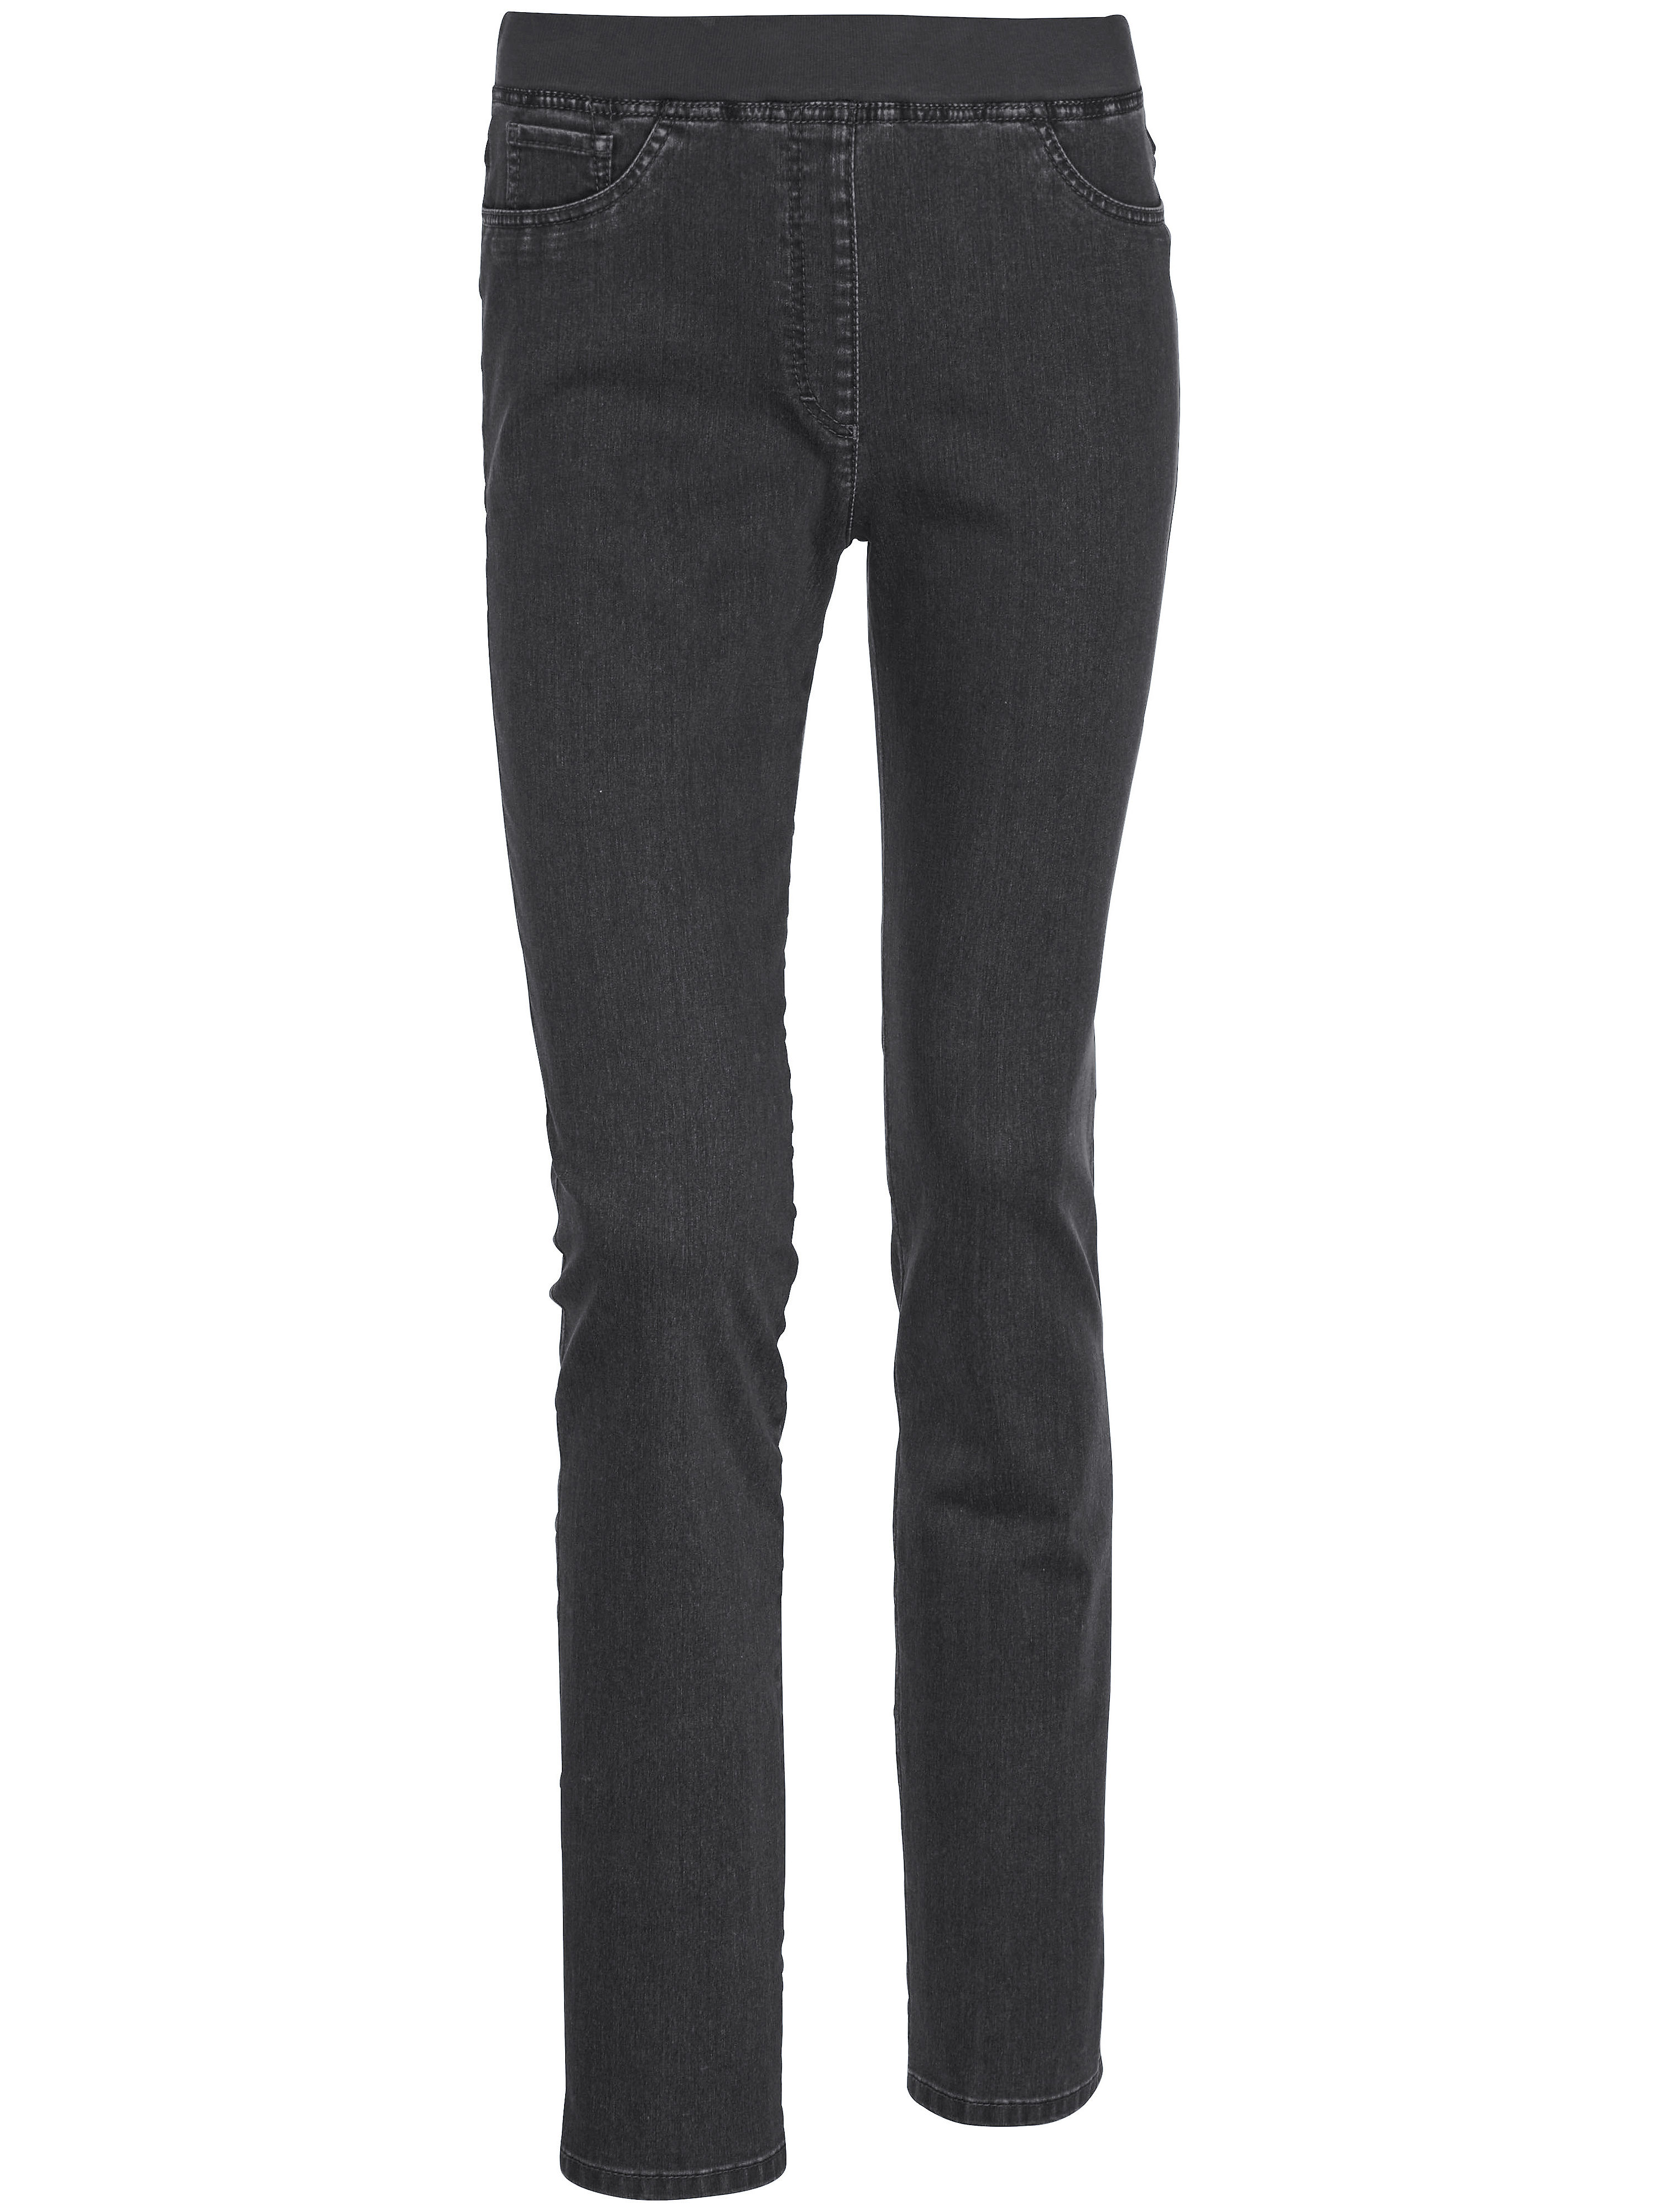 Image of   'Comfort Plus'- jeans, Raphaela by Brax - CARINA Fra Raphaela by Brax grå